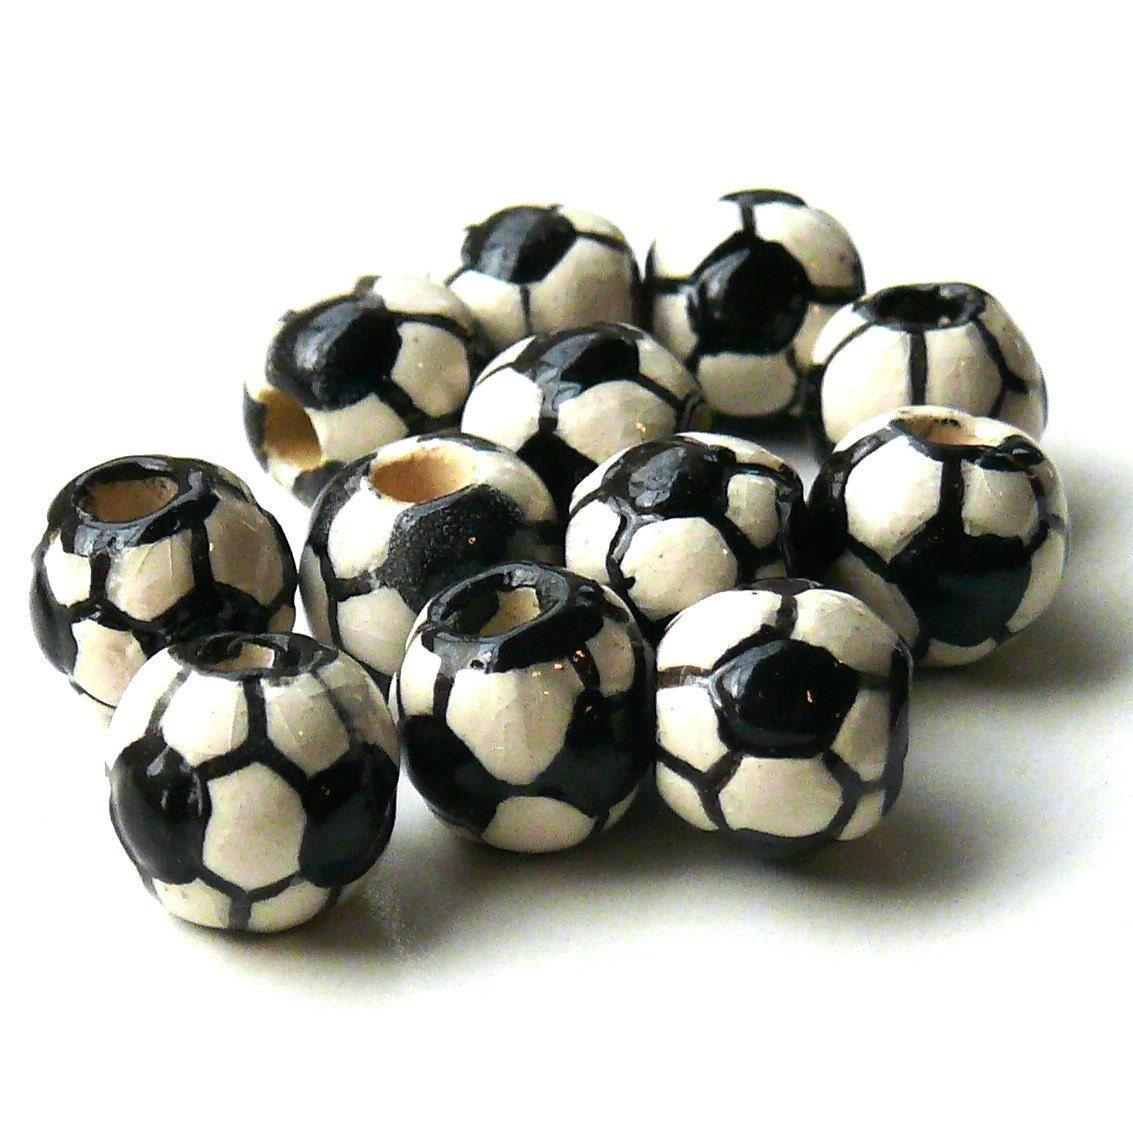 Ceramic Bead Beads: Ceramic Soccer Ball Beads 8mm 12 Beads